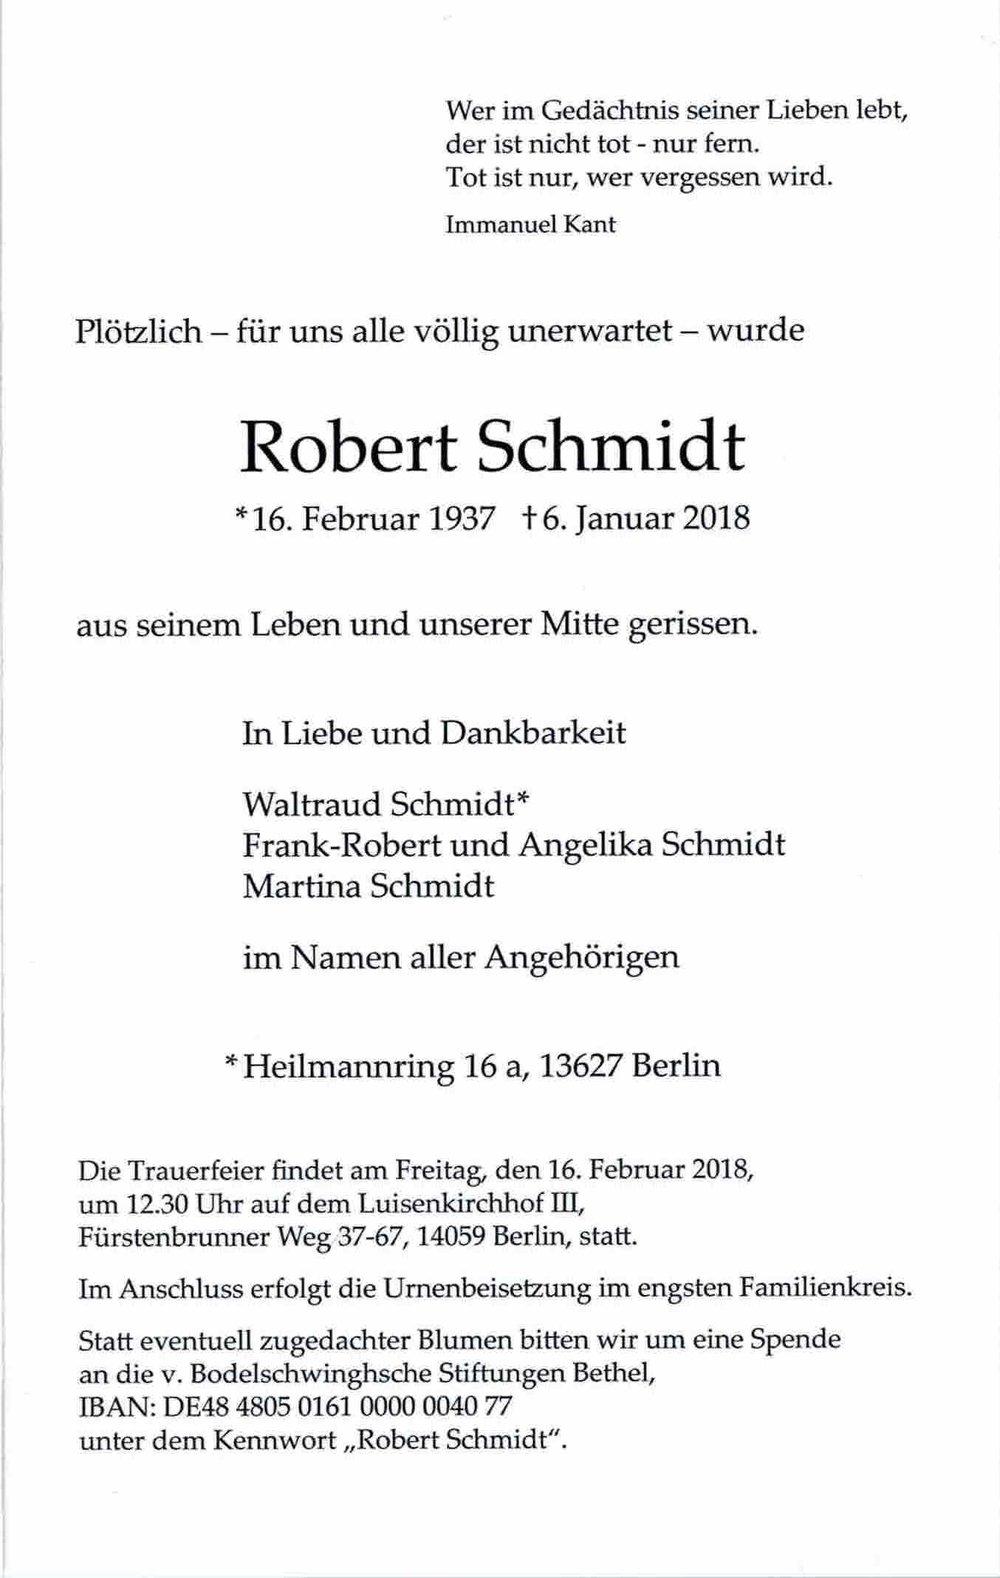 Robert Schmidt Traueranzeige.jpg